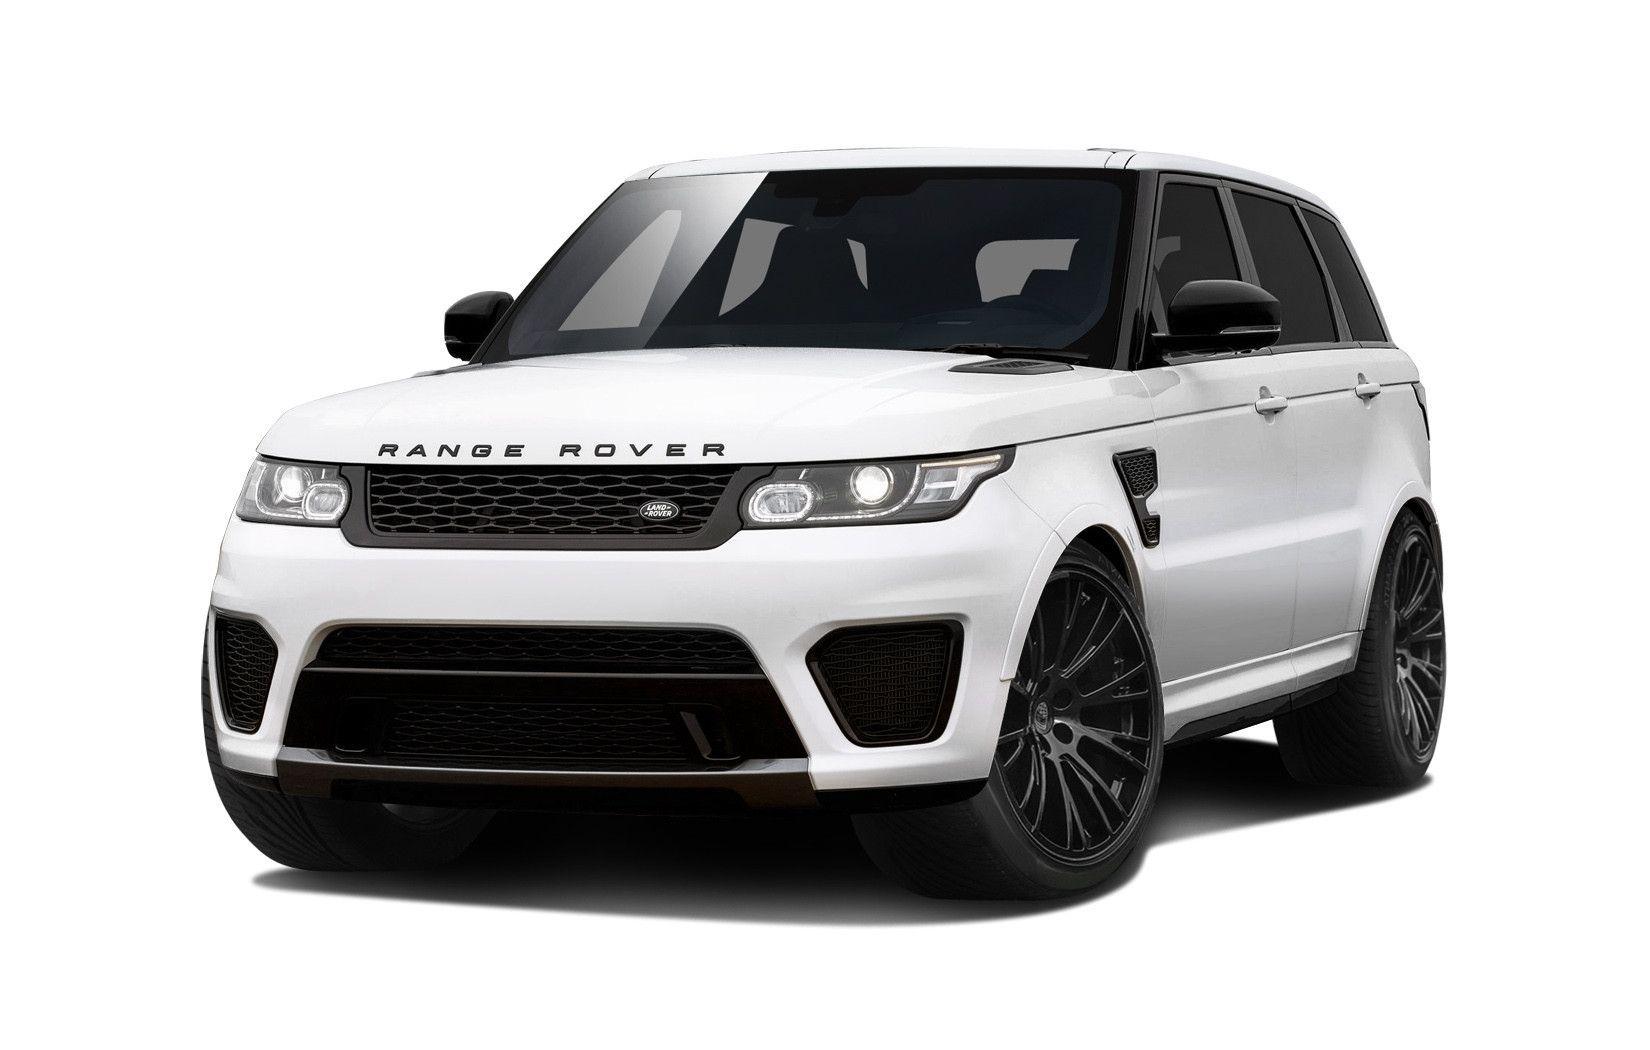 20142015 Land Rover Range Rover Sport Vaero SVR Look Body